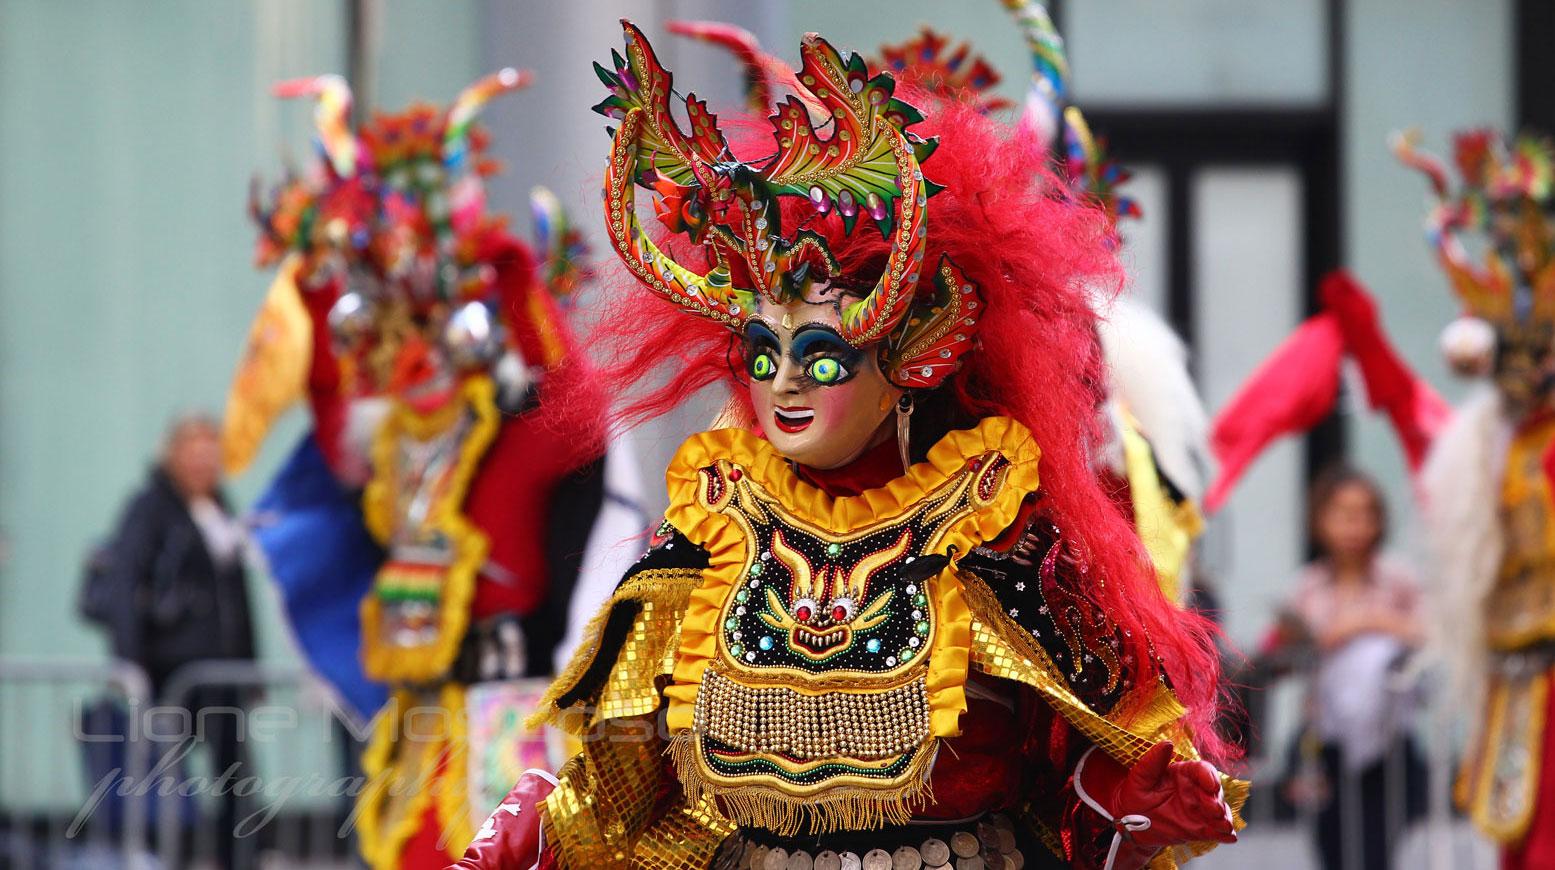 danzas bolivianas chicas